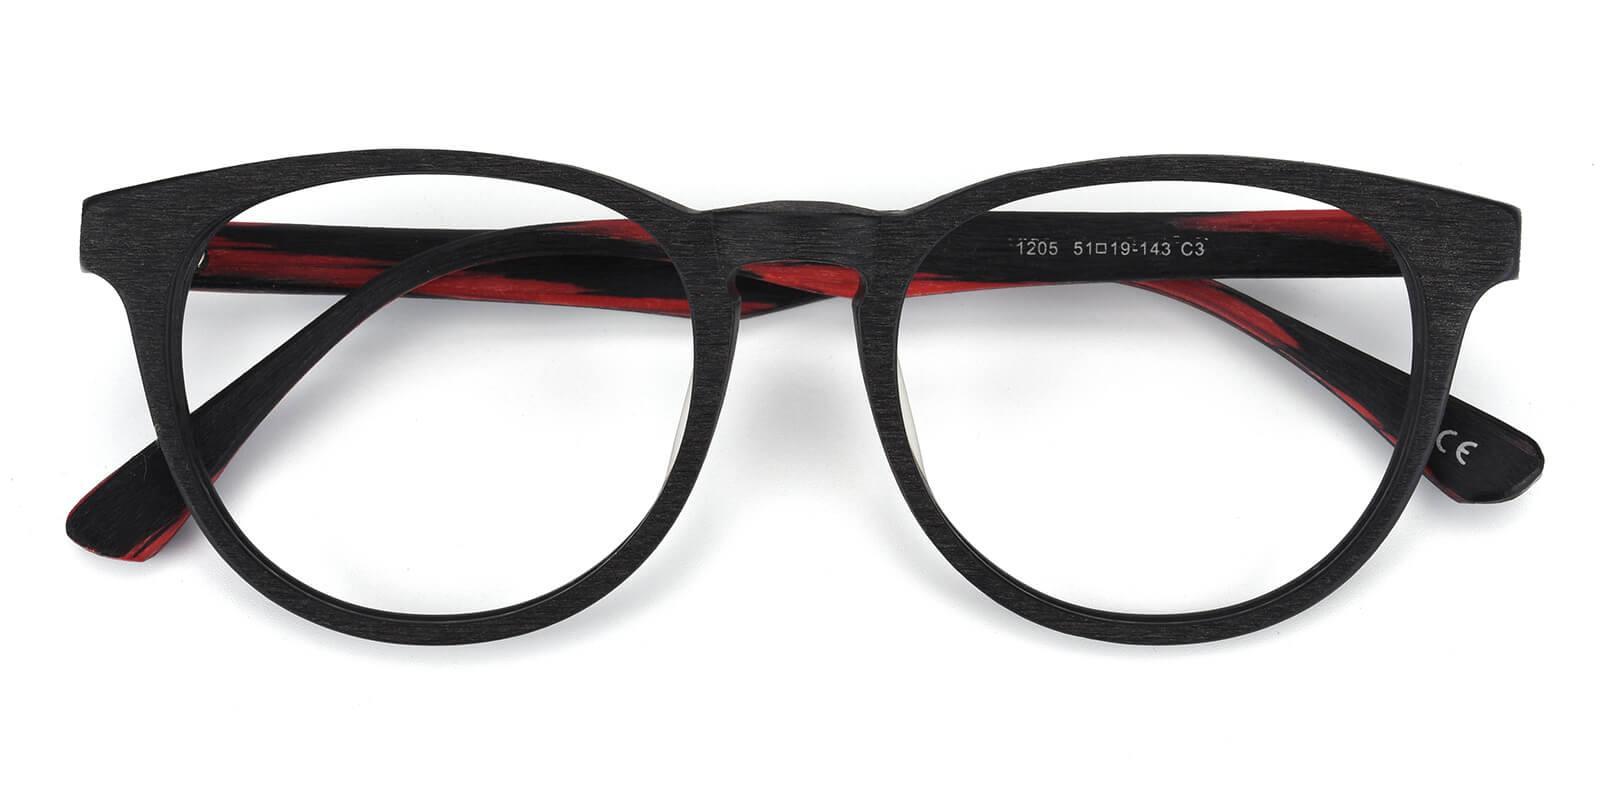 Rechela-Red-Round-Acetate-Eyeglasses-detail